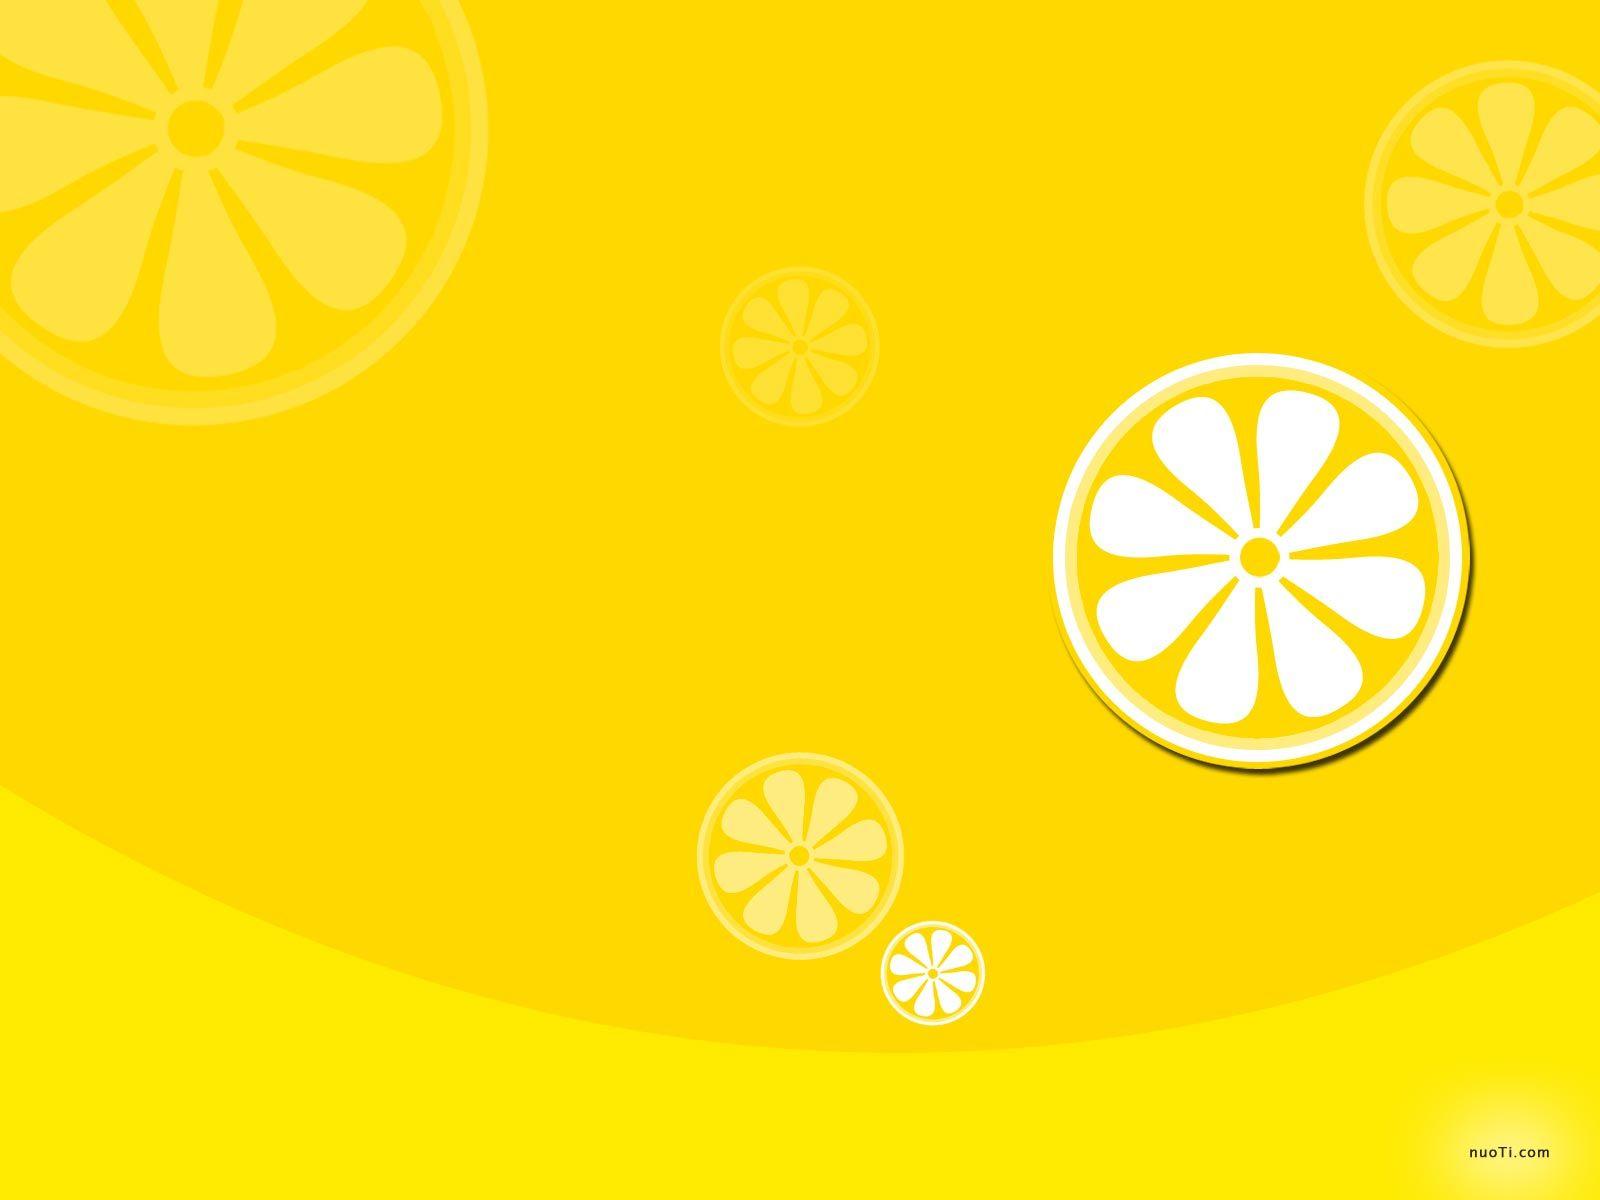 Yellow Girly Background Yellow Theme Yellow wallpaper